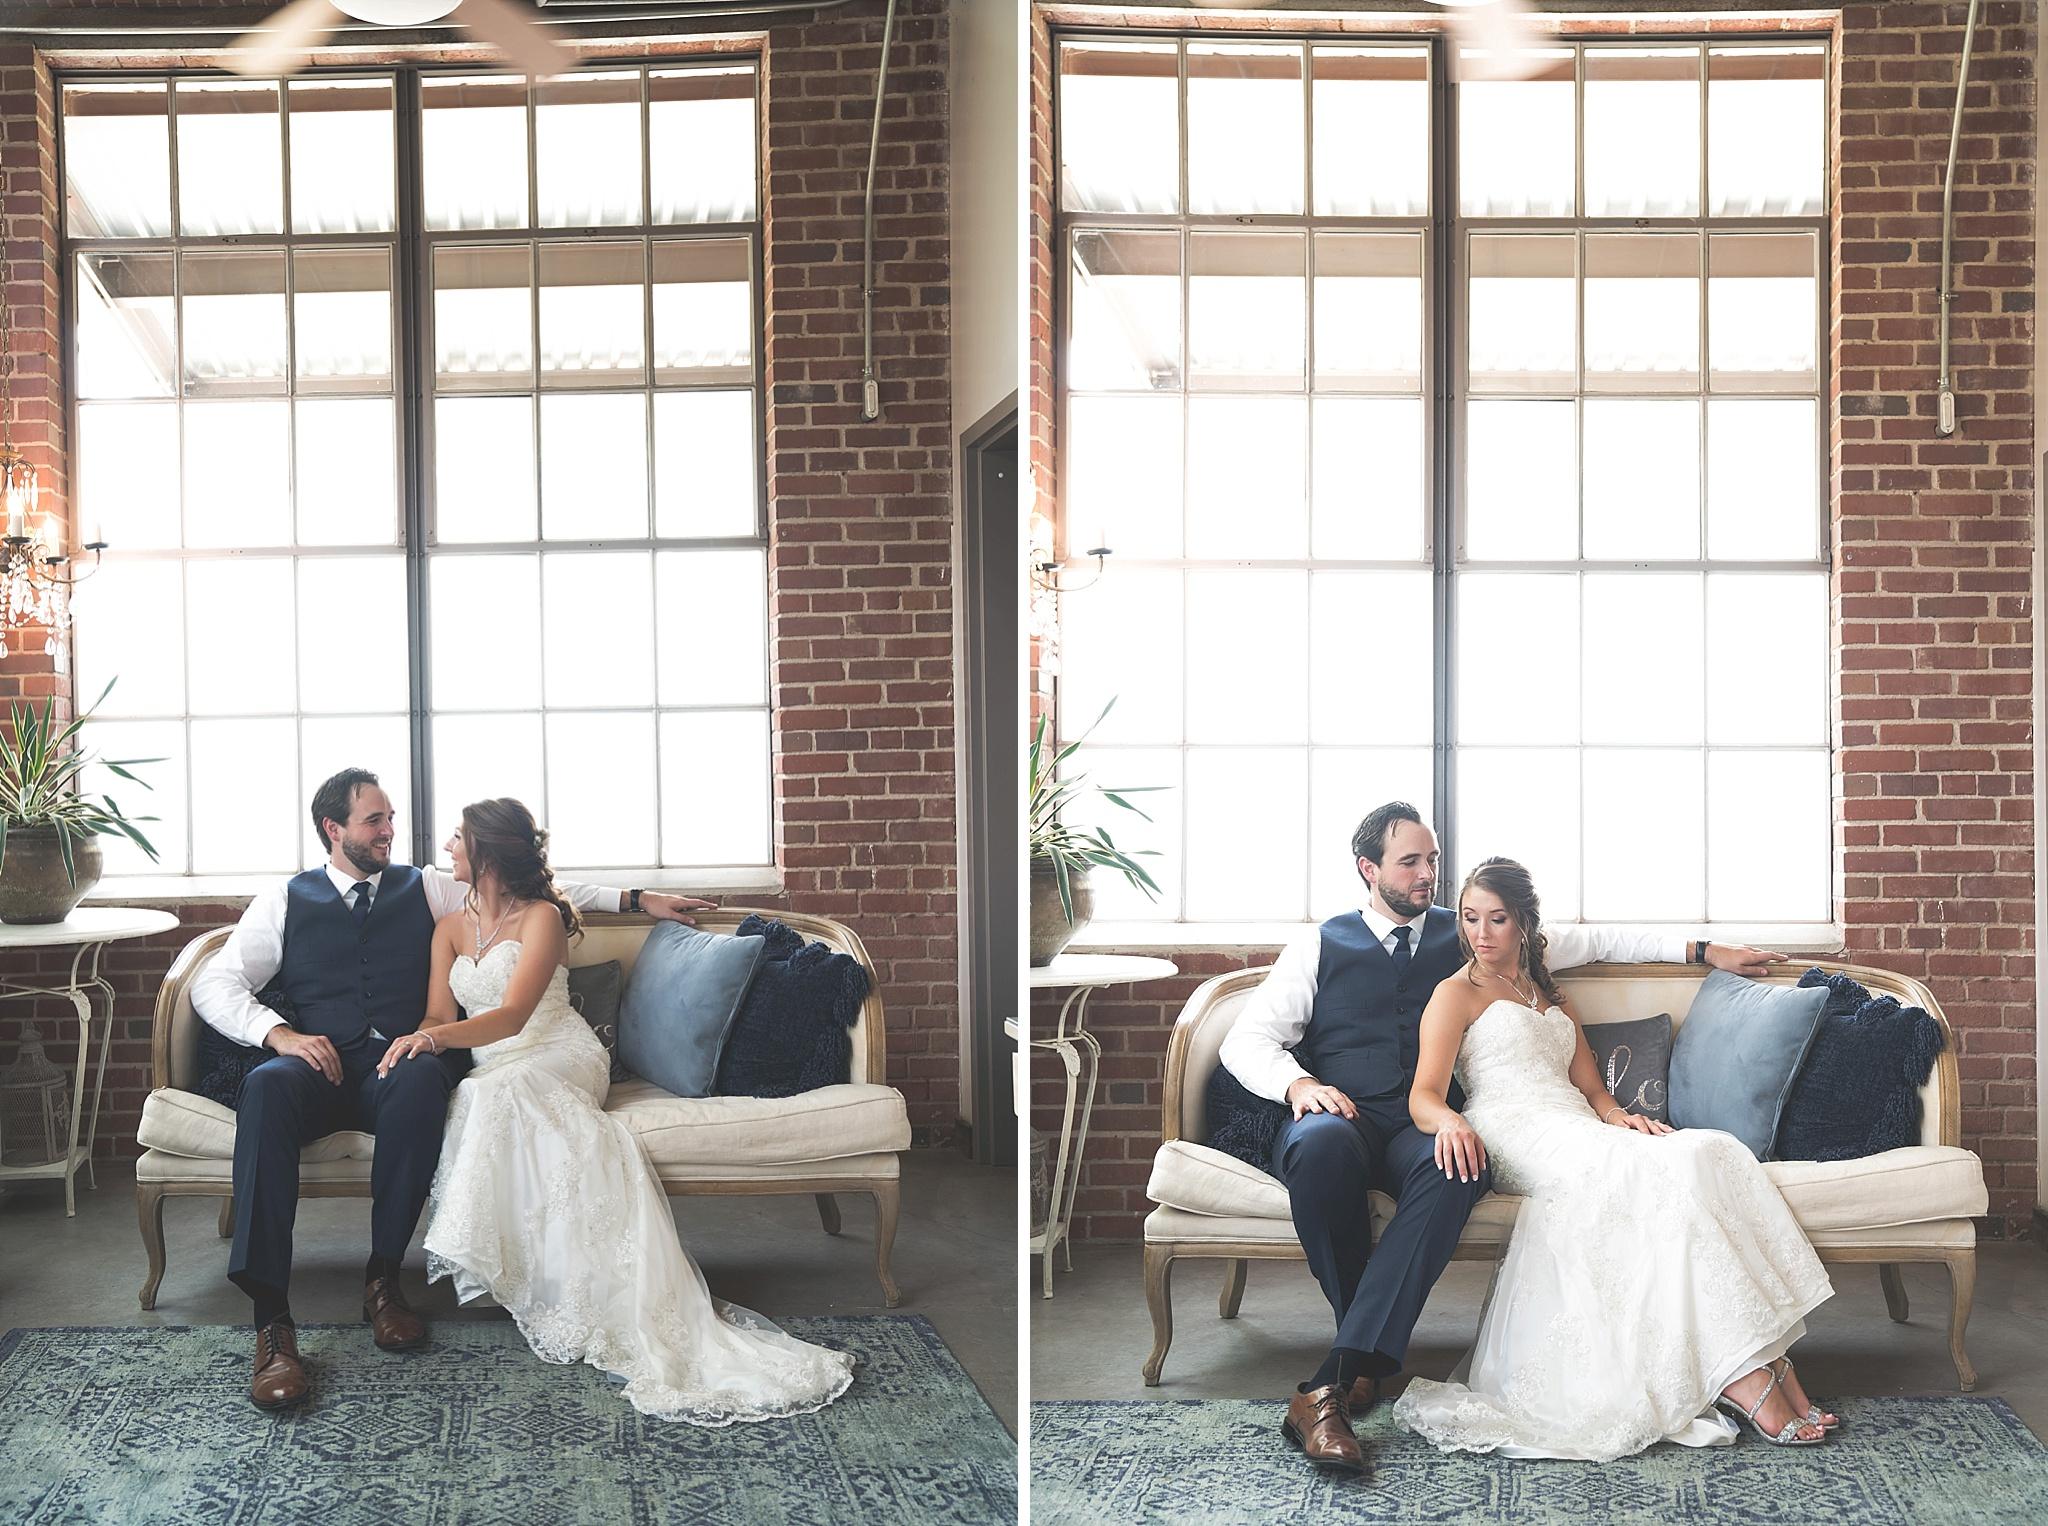 Rickhouse-Durham-NC-Wedding-Photographer-039.jpg